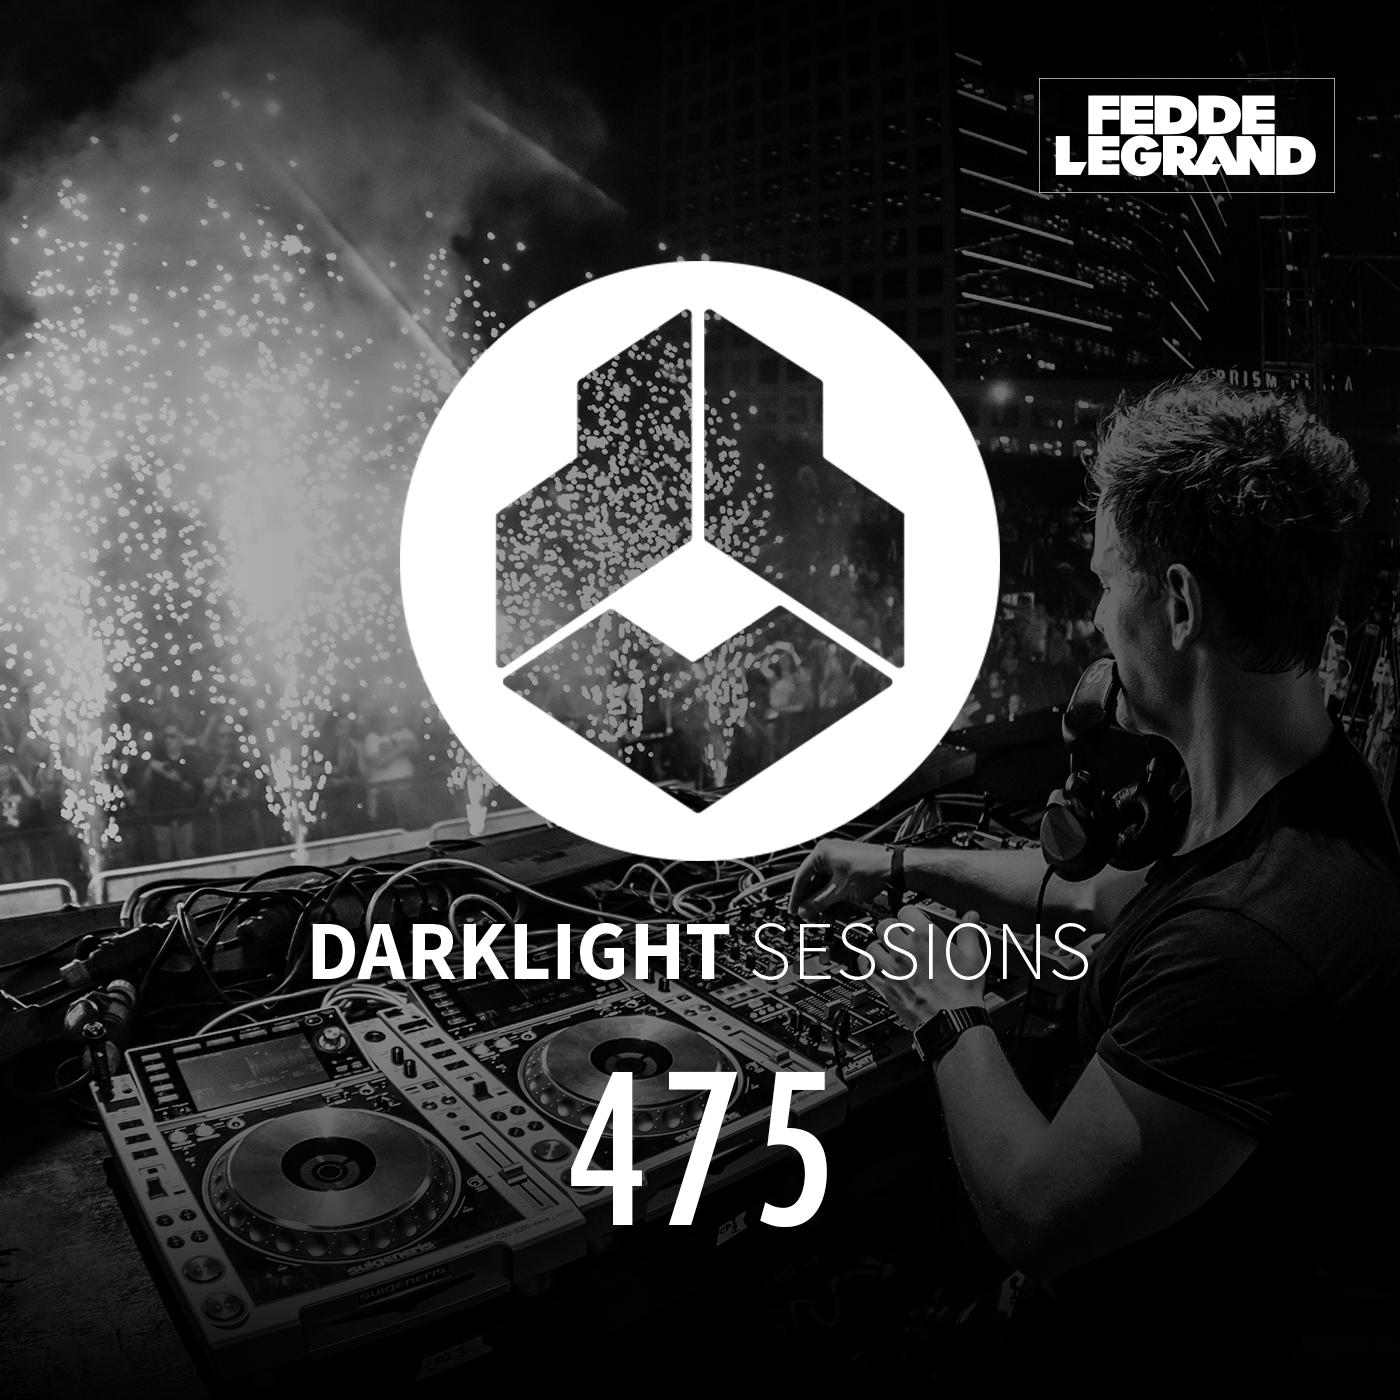 Darklight Sessions 475